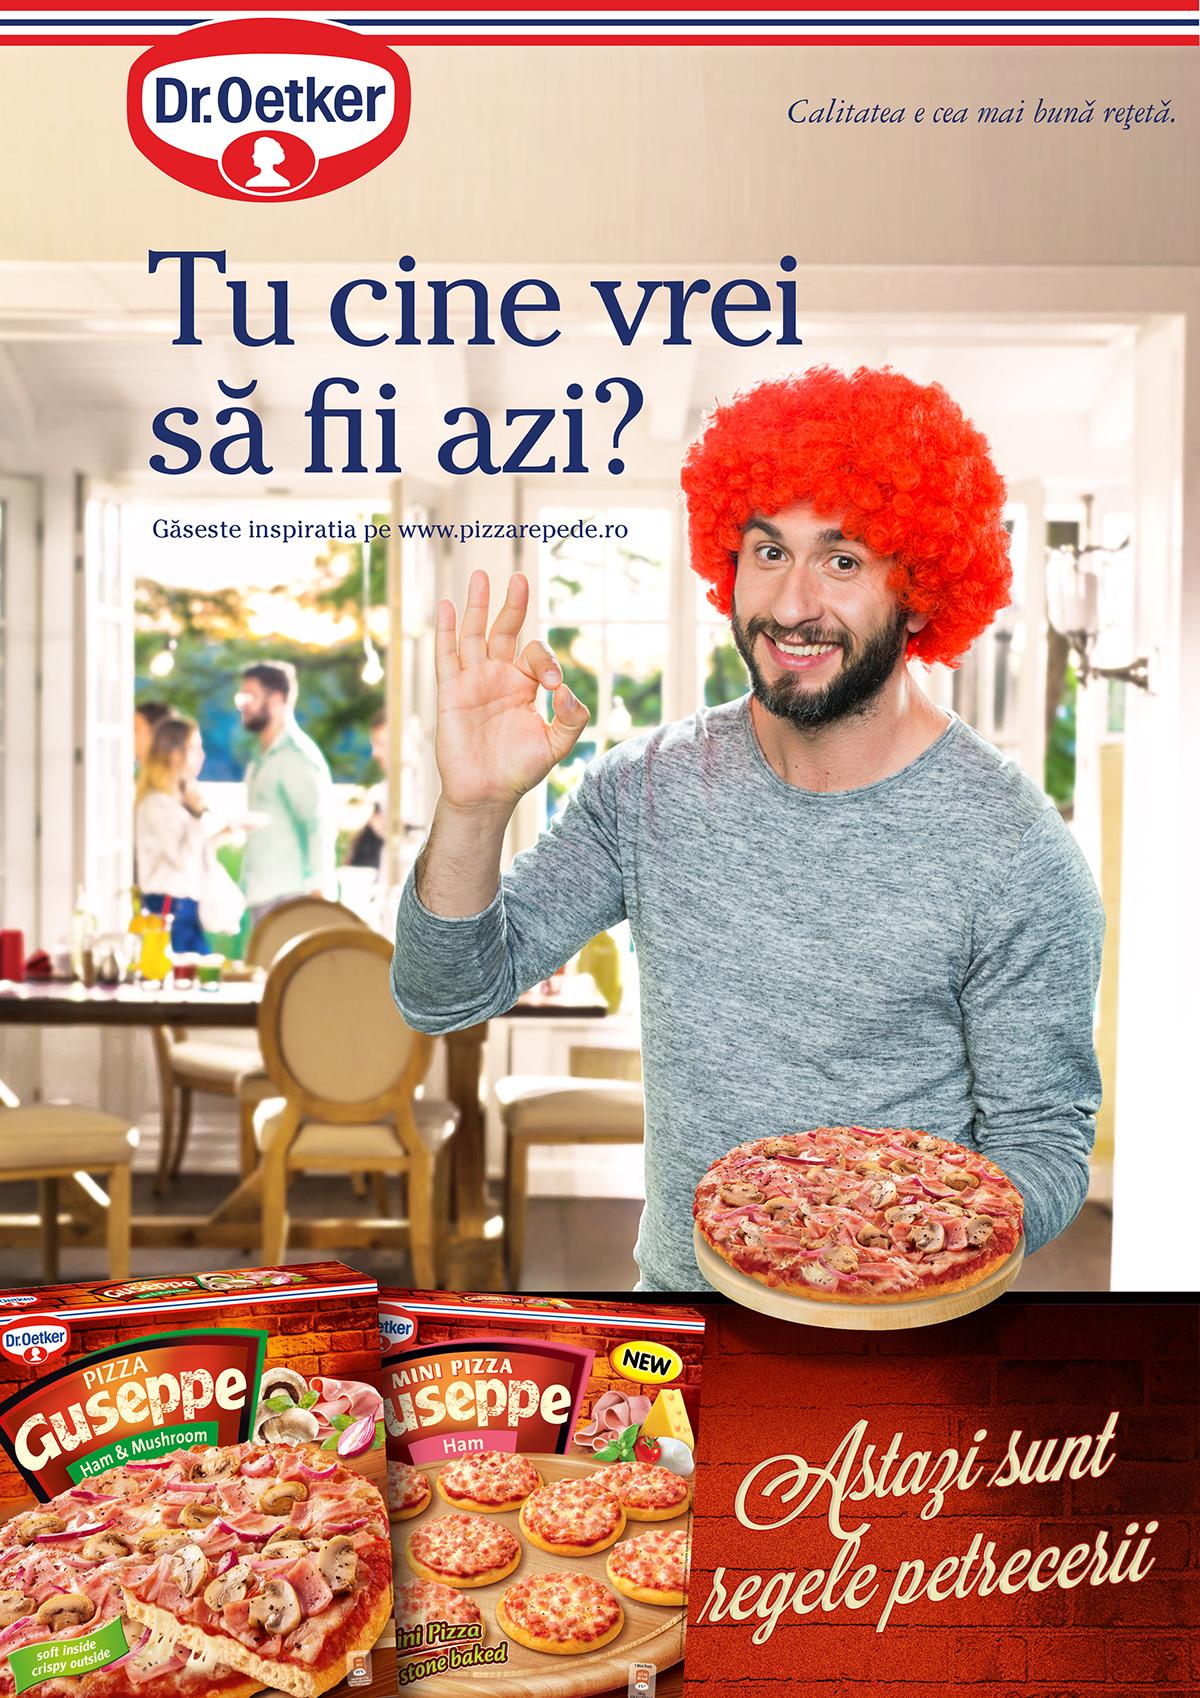 kv-pizza-guseppe-photo-fin-mic